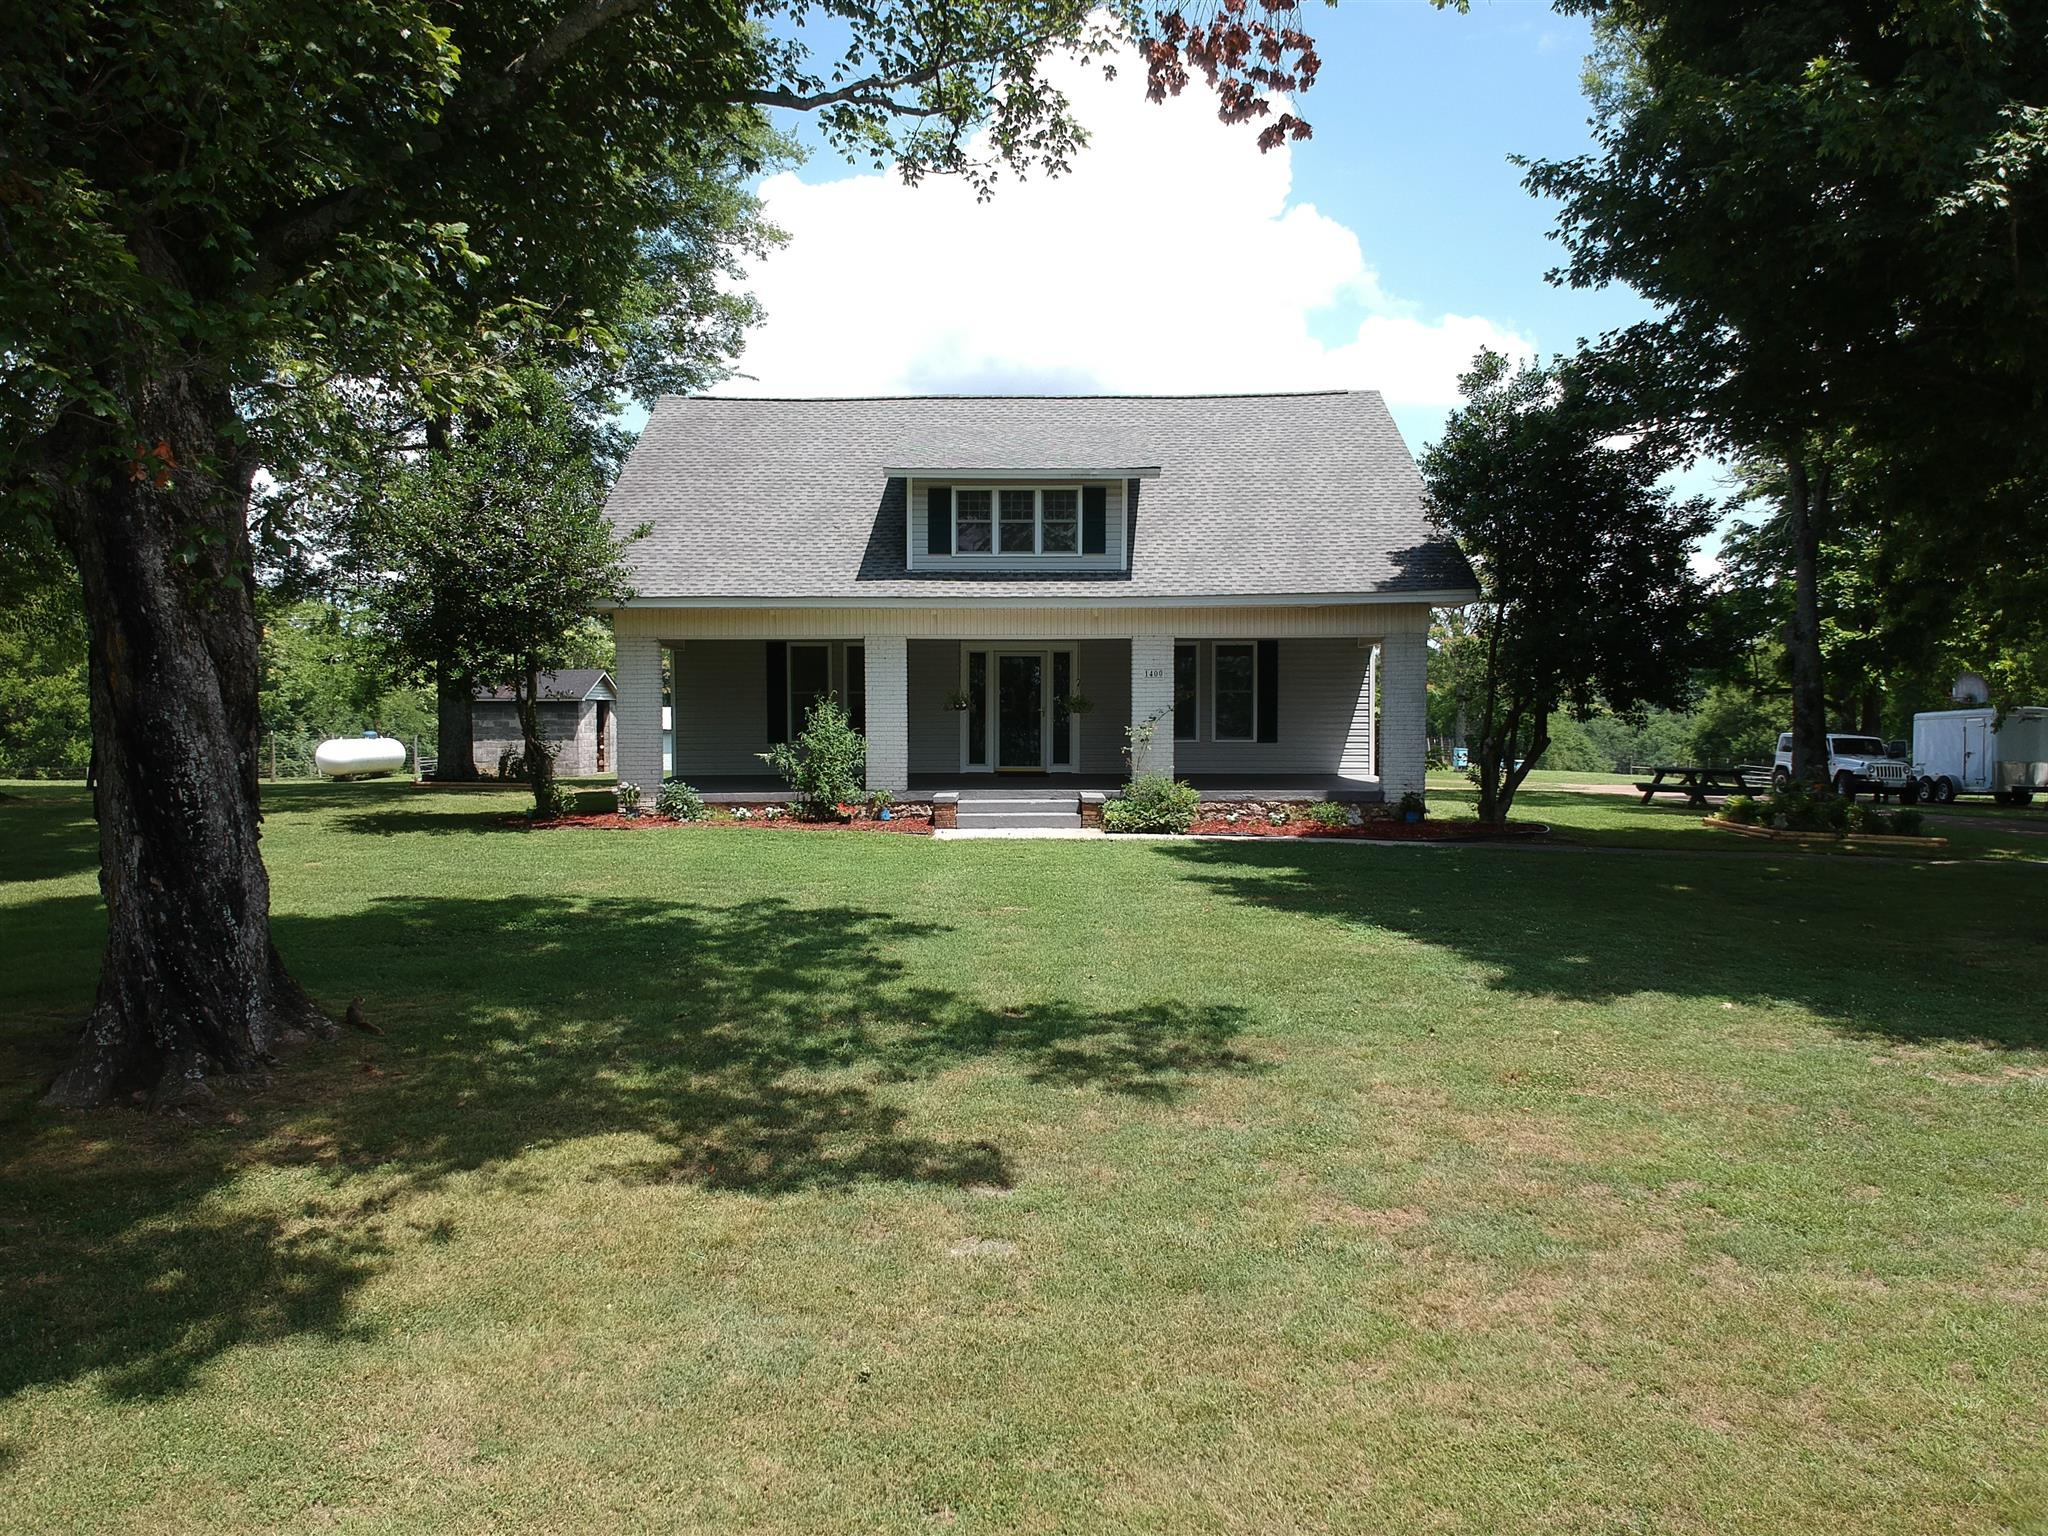 1400 Ragsdale Ln, Pulaski, TN 38478 - Pulaski, TN real estate listing